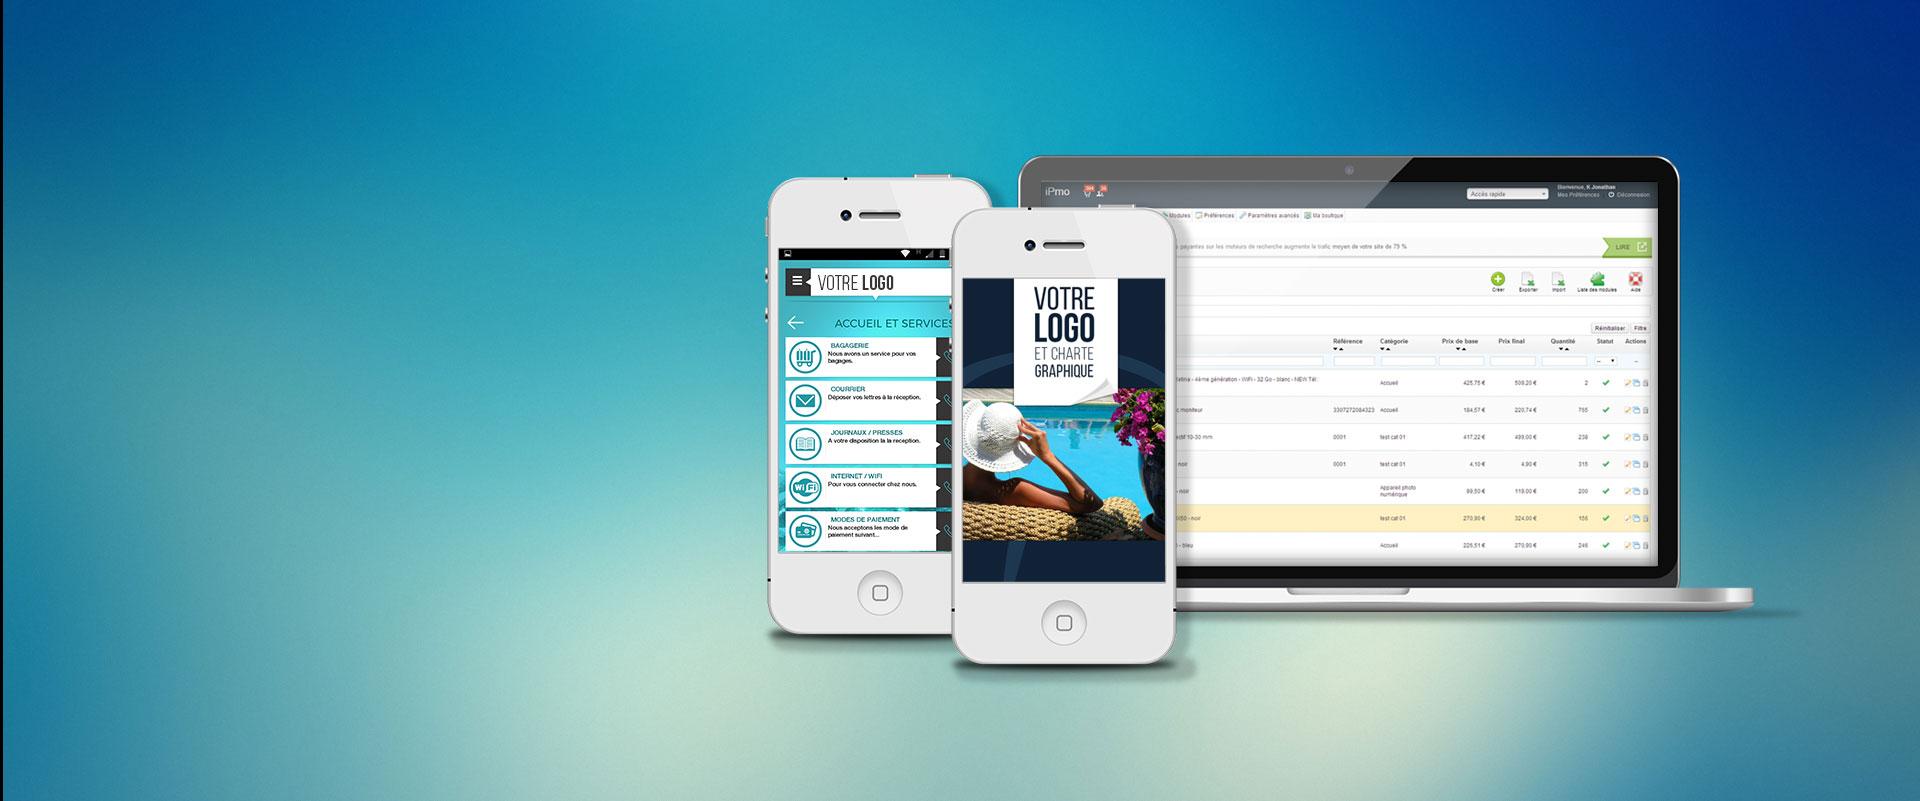 Application mobile relation client adminsitrable